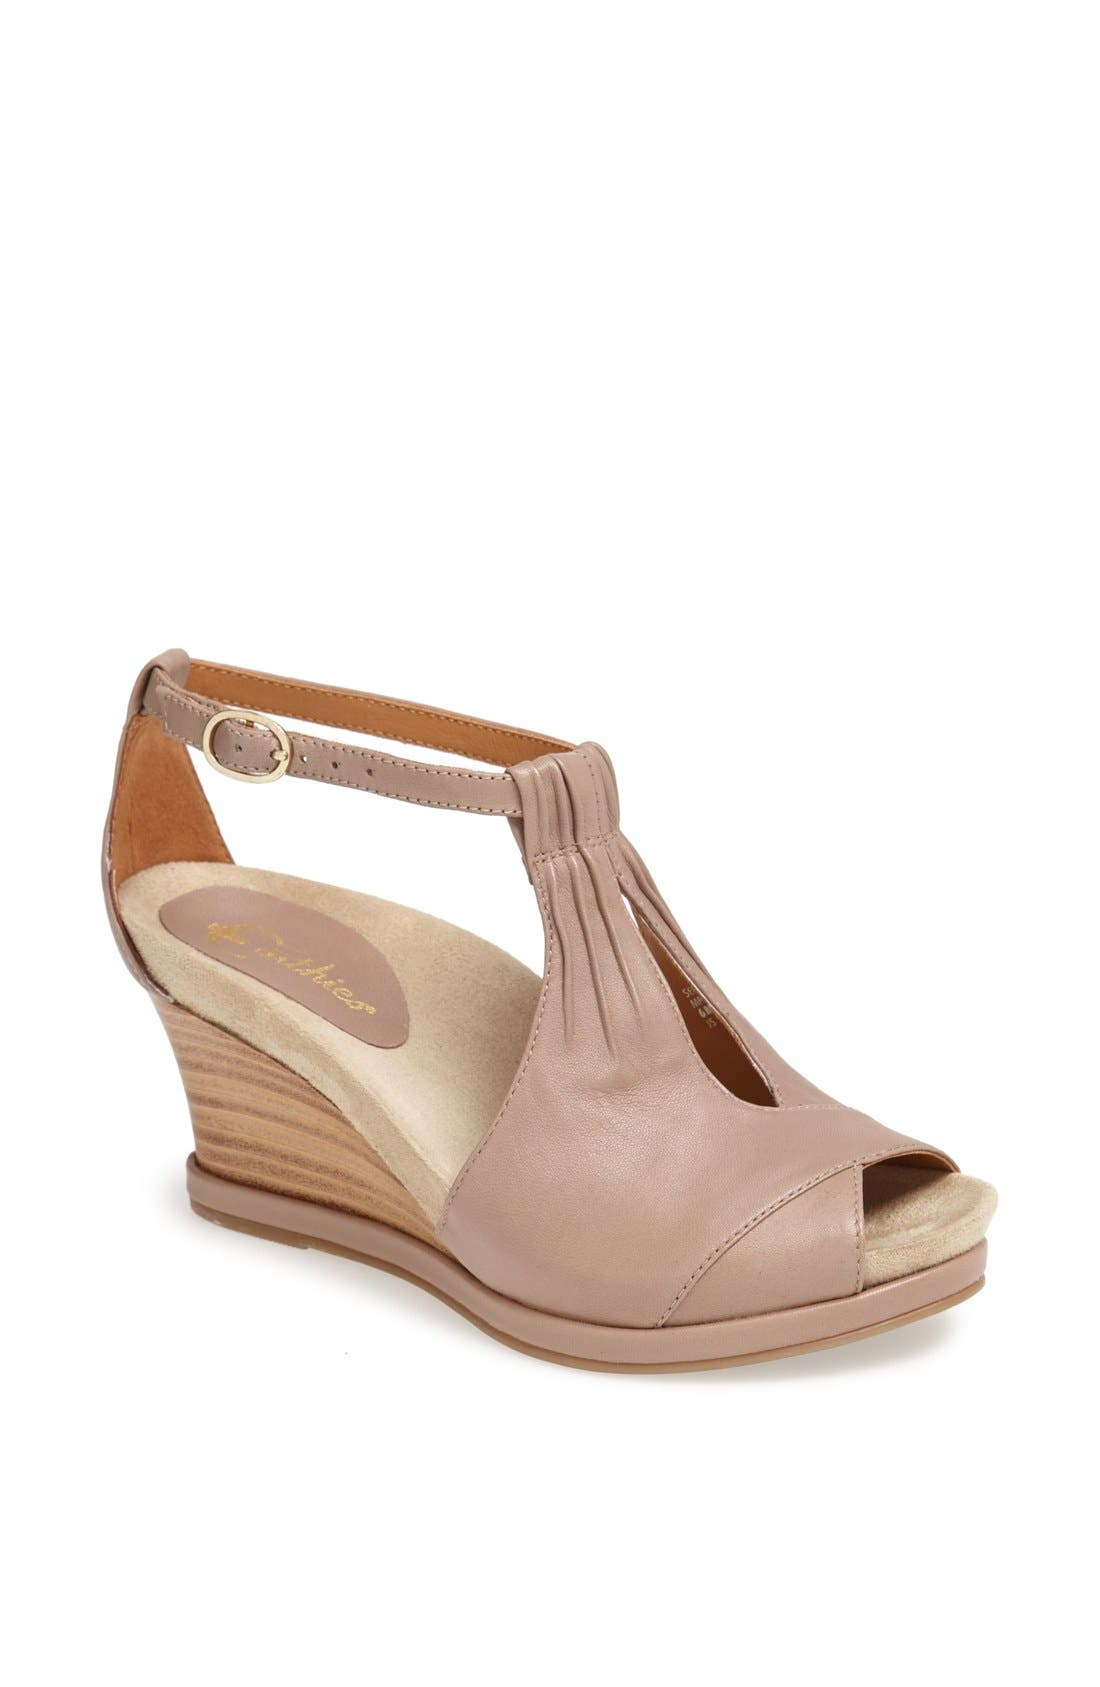 Main Image - Earthies® 'Seria' Sandal